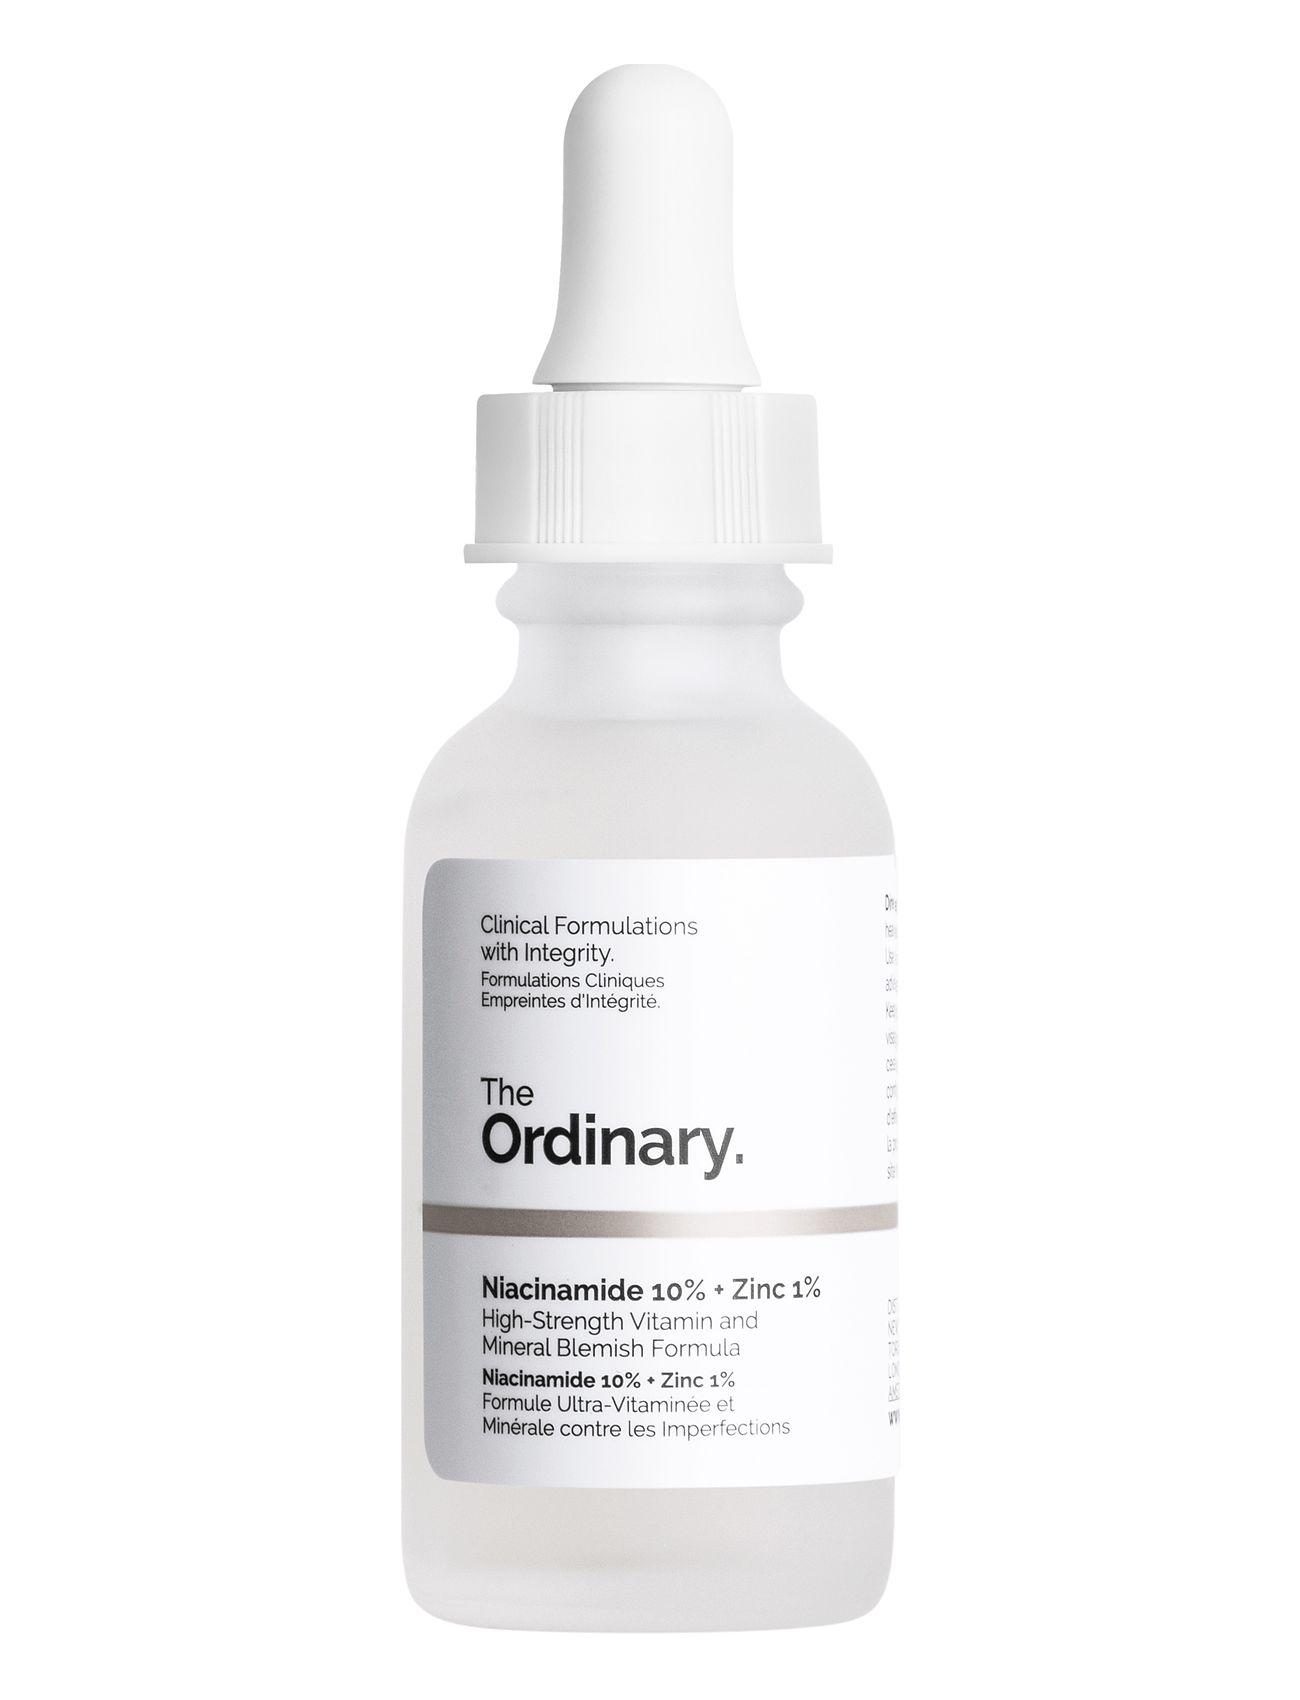 Image of Niacinamide 10% + Zinc 1% Hudpleje Serum Nude The Ordinary (3513565461)